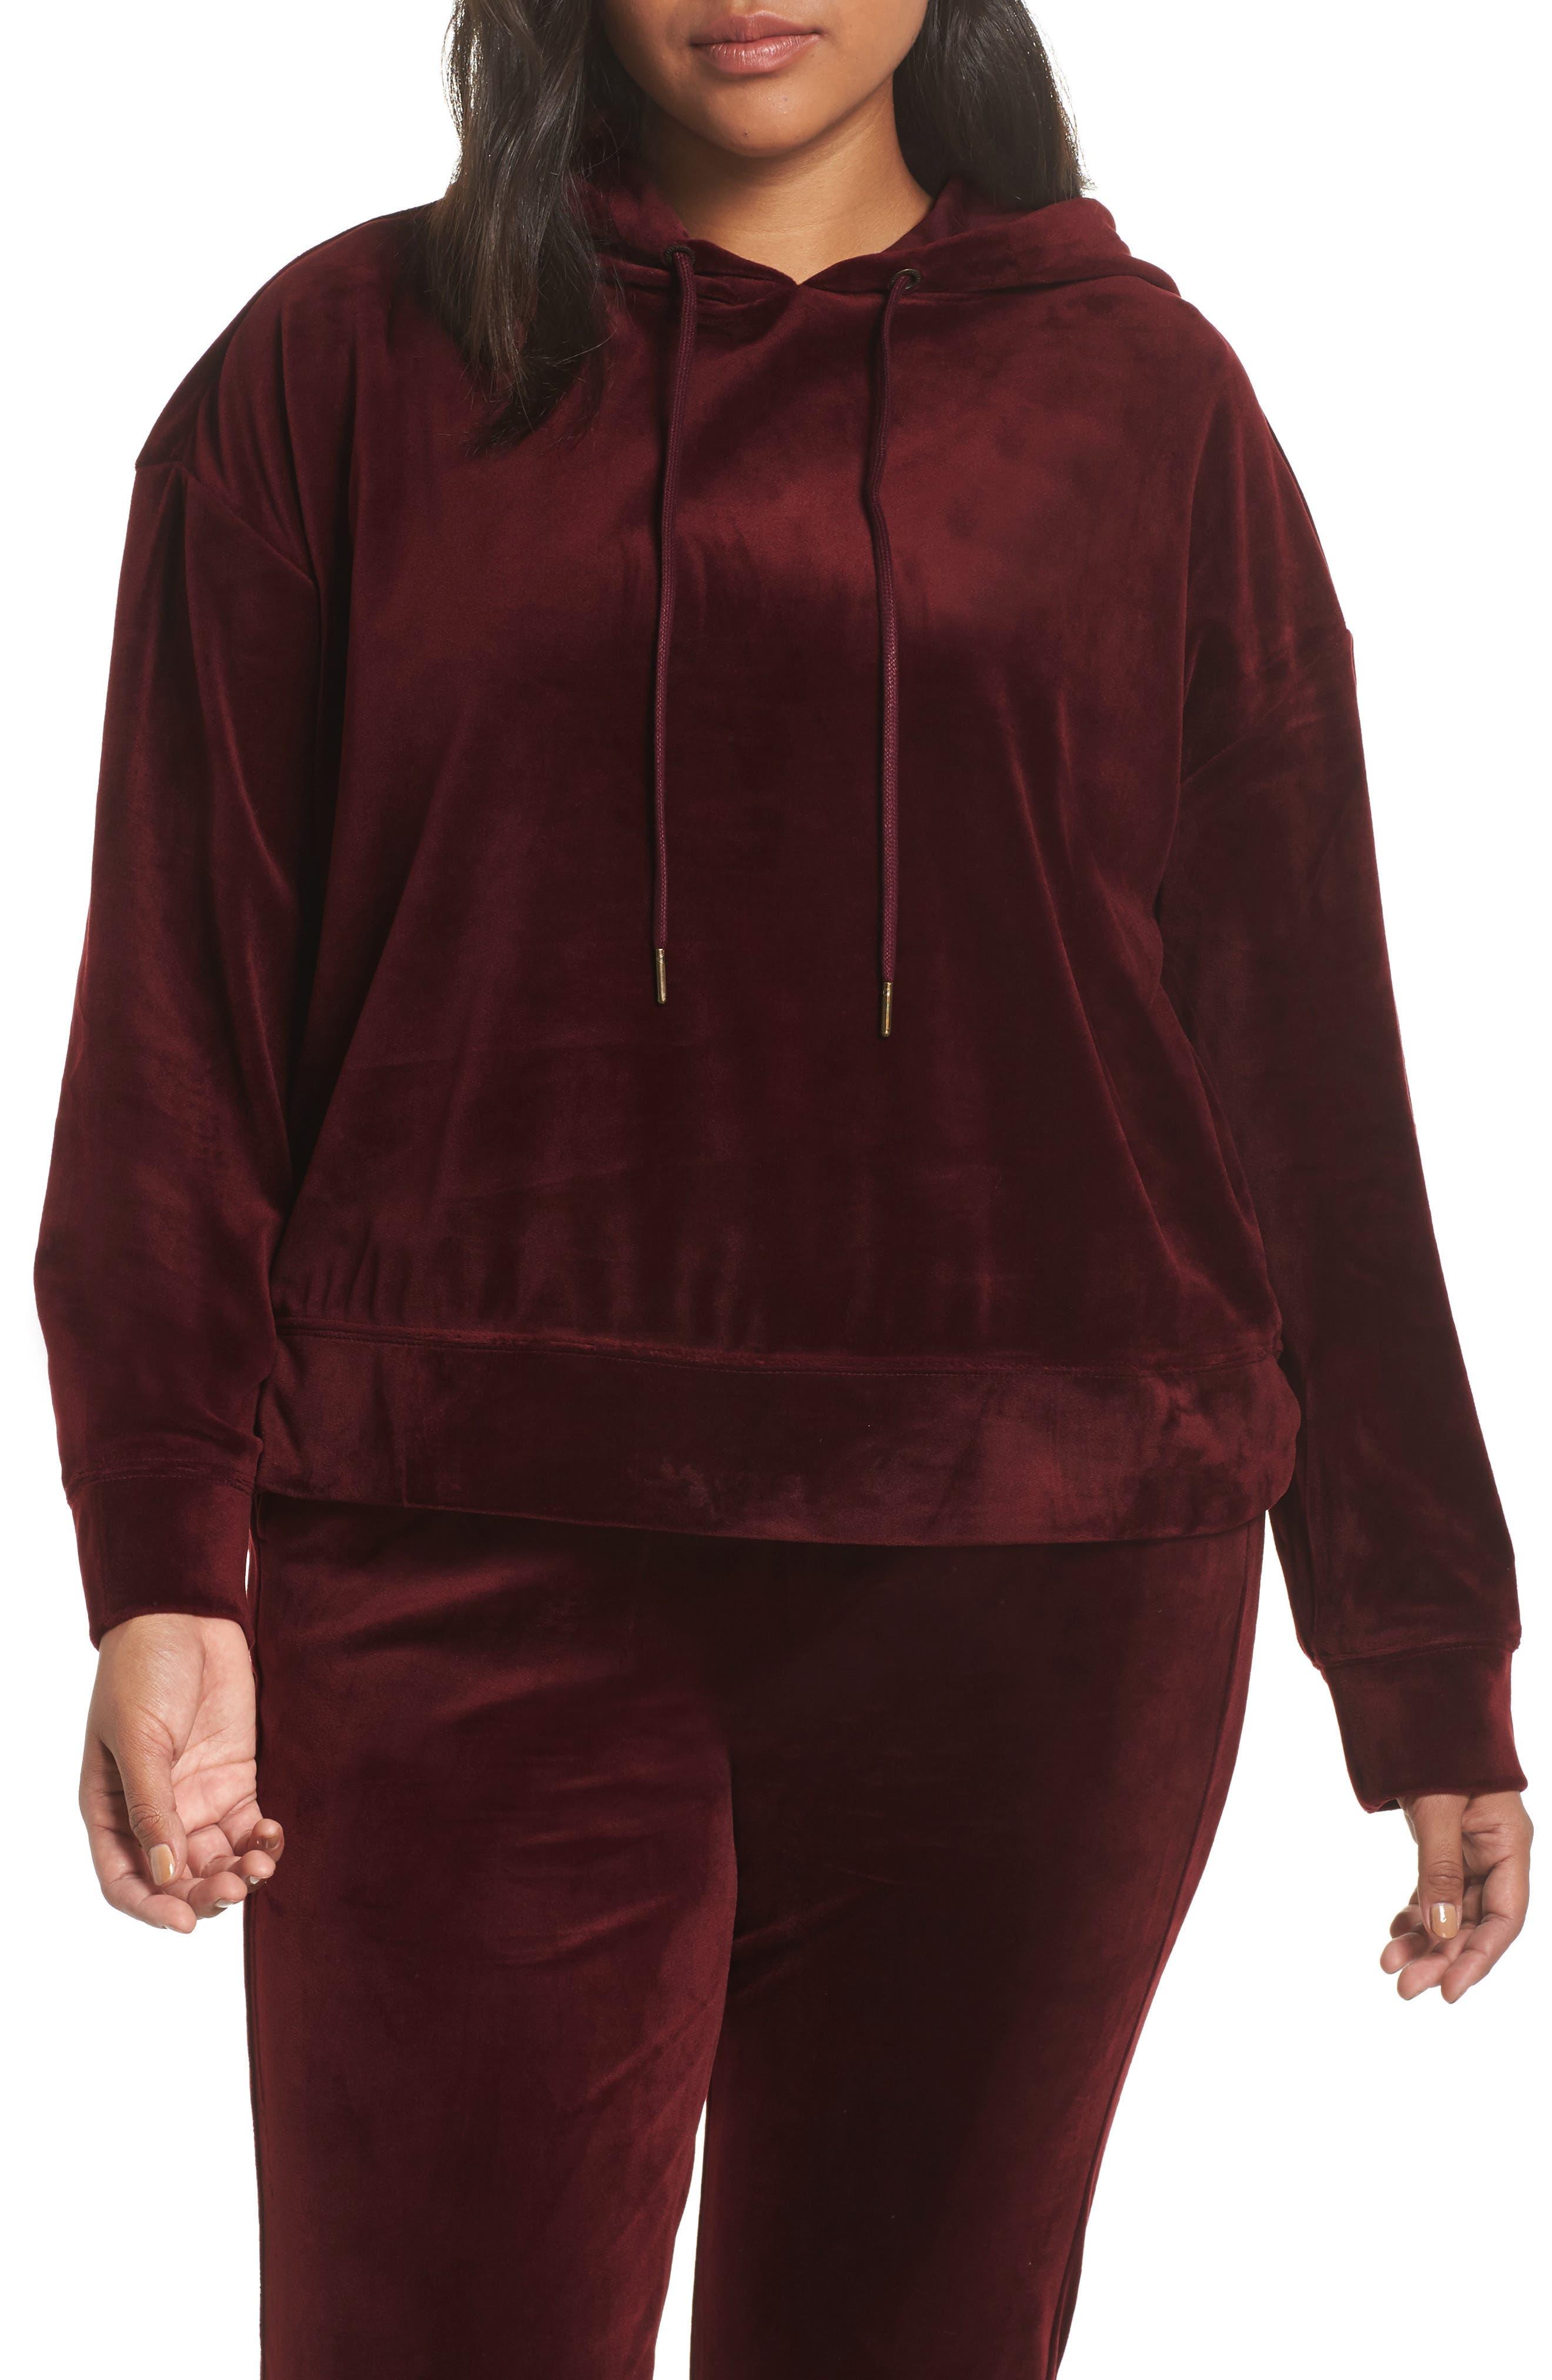 Melrose Brigade Velour Hoodie Sweater,                             Alternate thumbnail 2, color,                             SCARLET